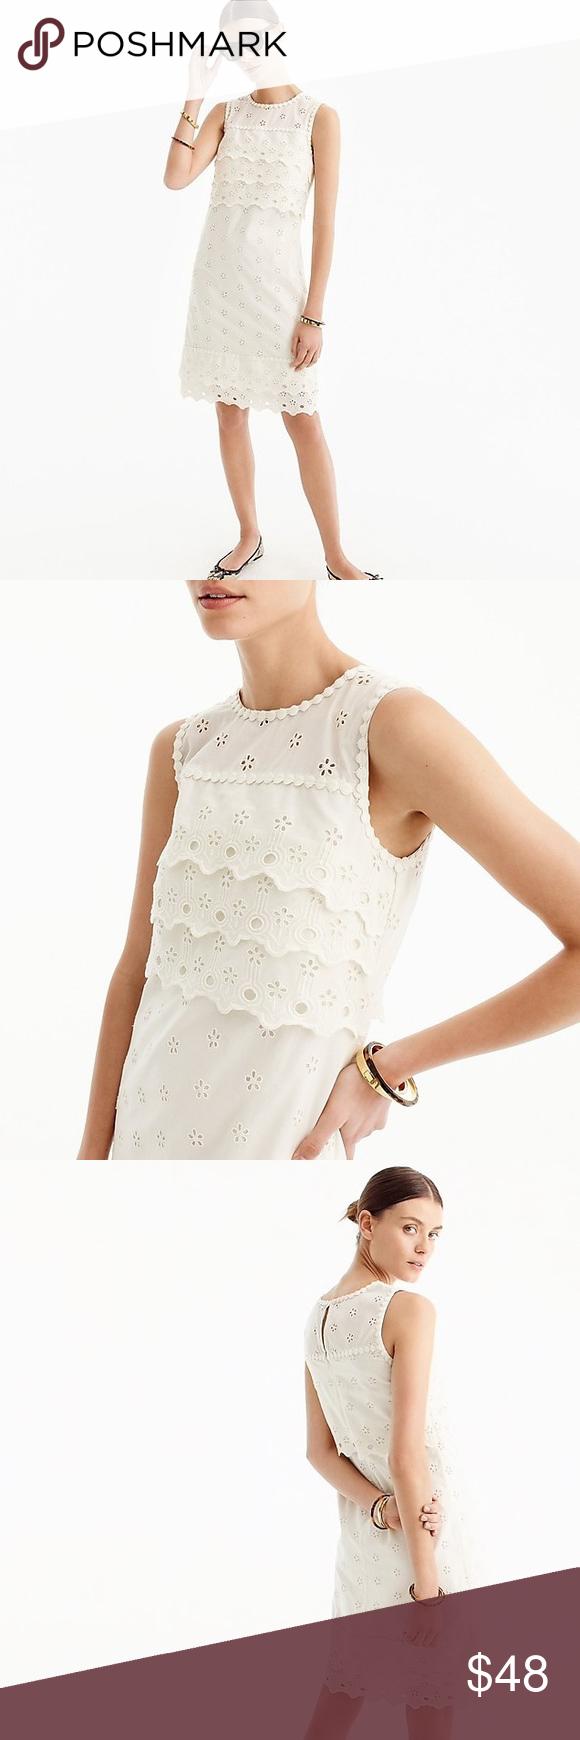 Nwt Jcrew Eyelet Shift Dress White Eyelet Dress Dresses Eyelet Dress [ 1740 x 580 Pixel ]